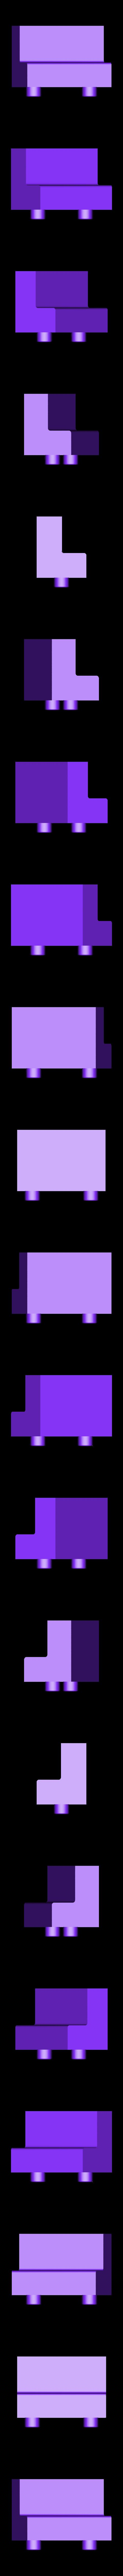 siège avant.STL Download free STL file charrette 2 roue • Object to 3D print, trixo416